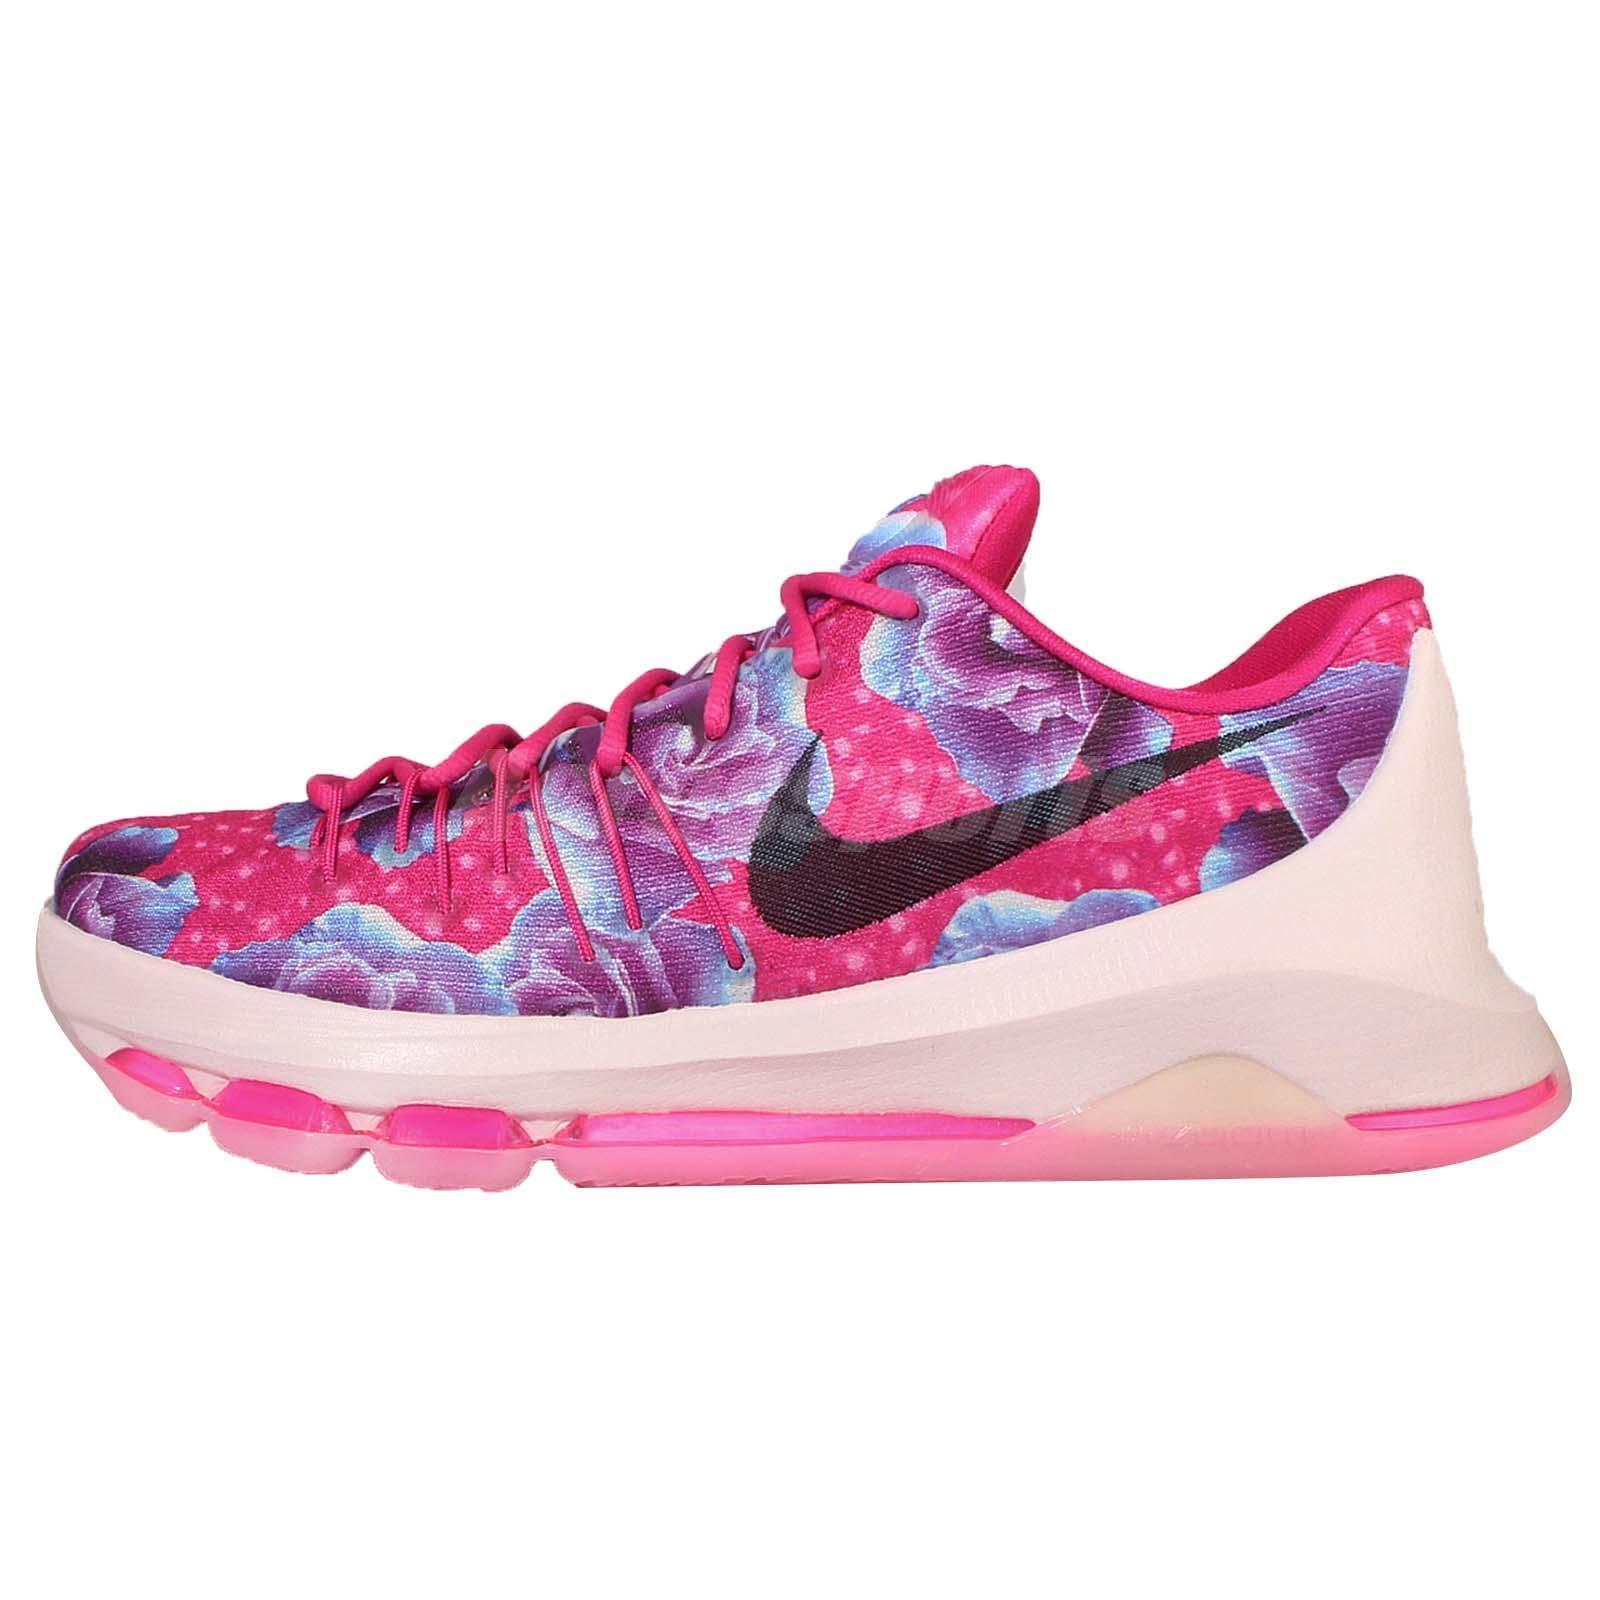 Nike KD 8 PRM EP Aunt Pearl Kay Yow Pink Mens Basketball Shoes 819149-603